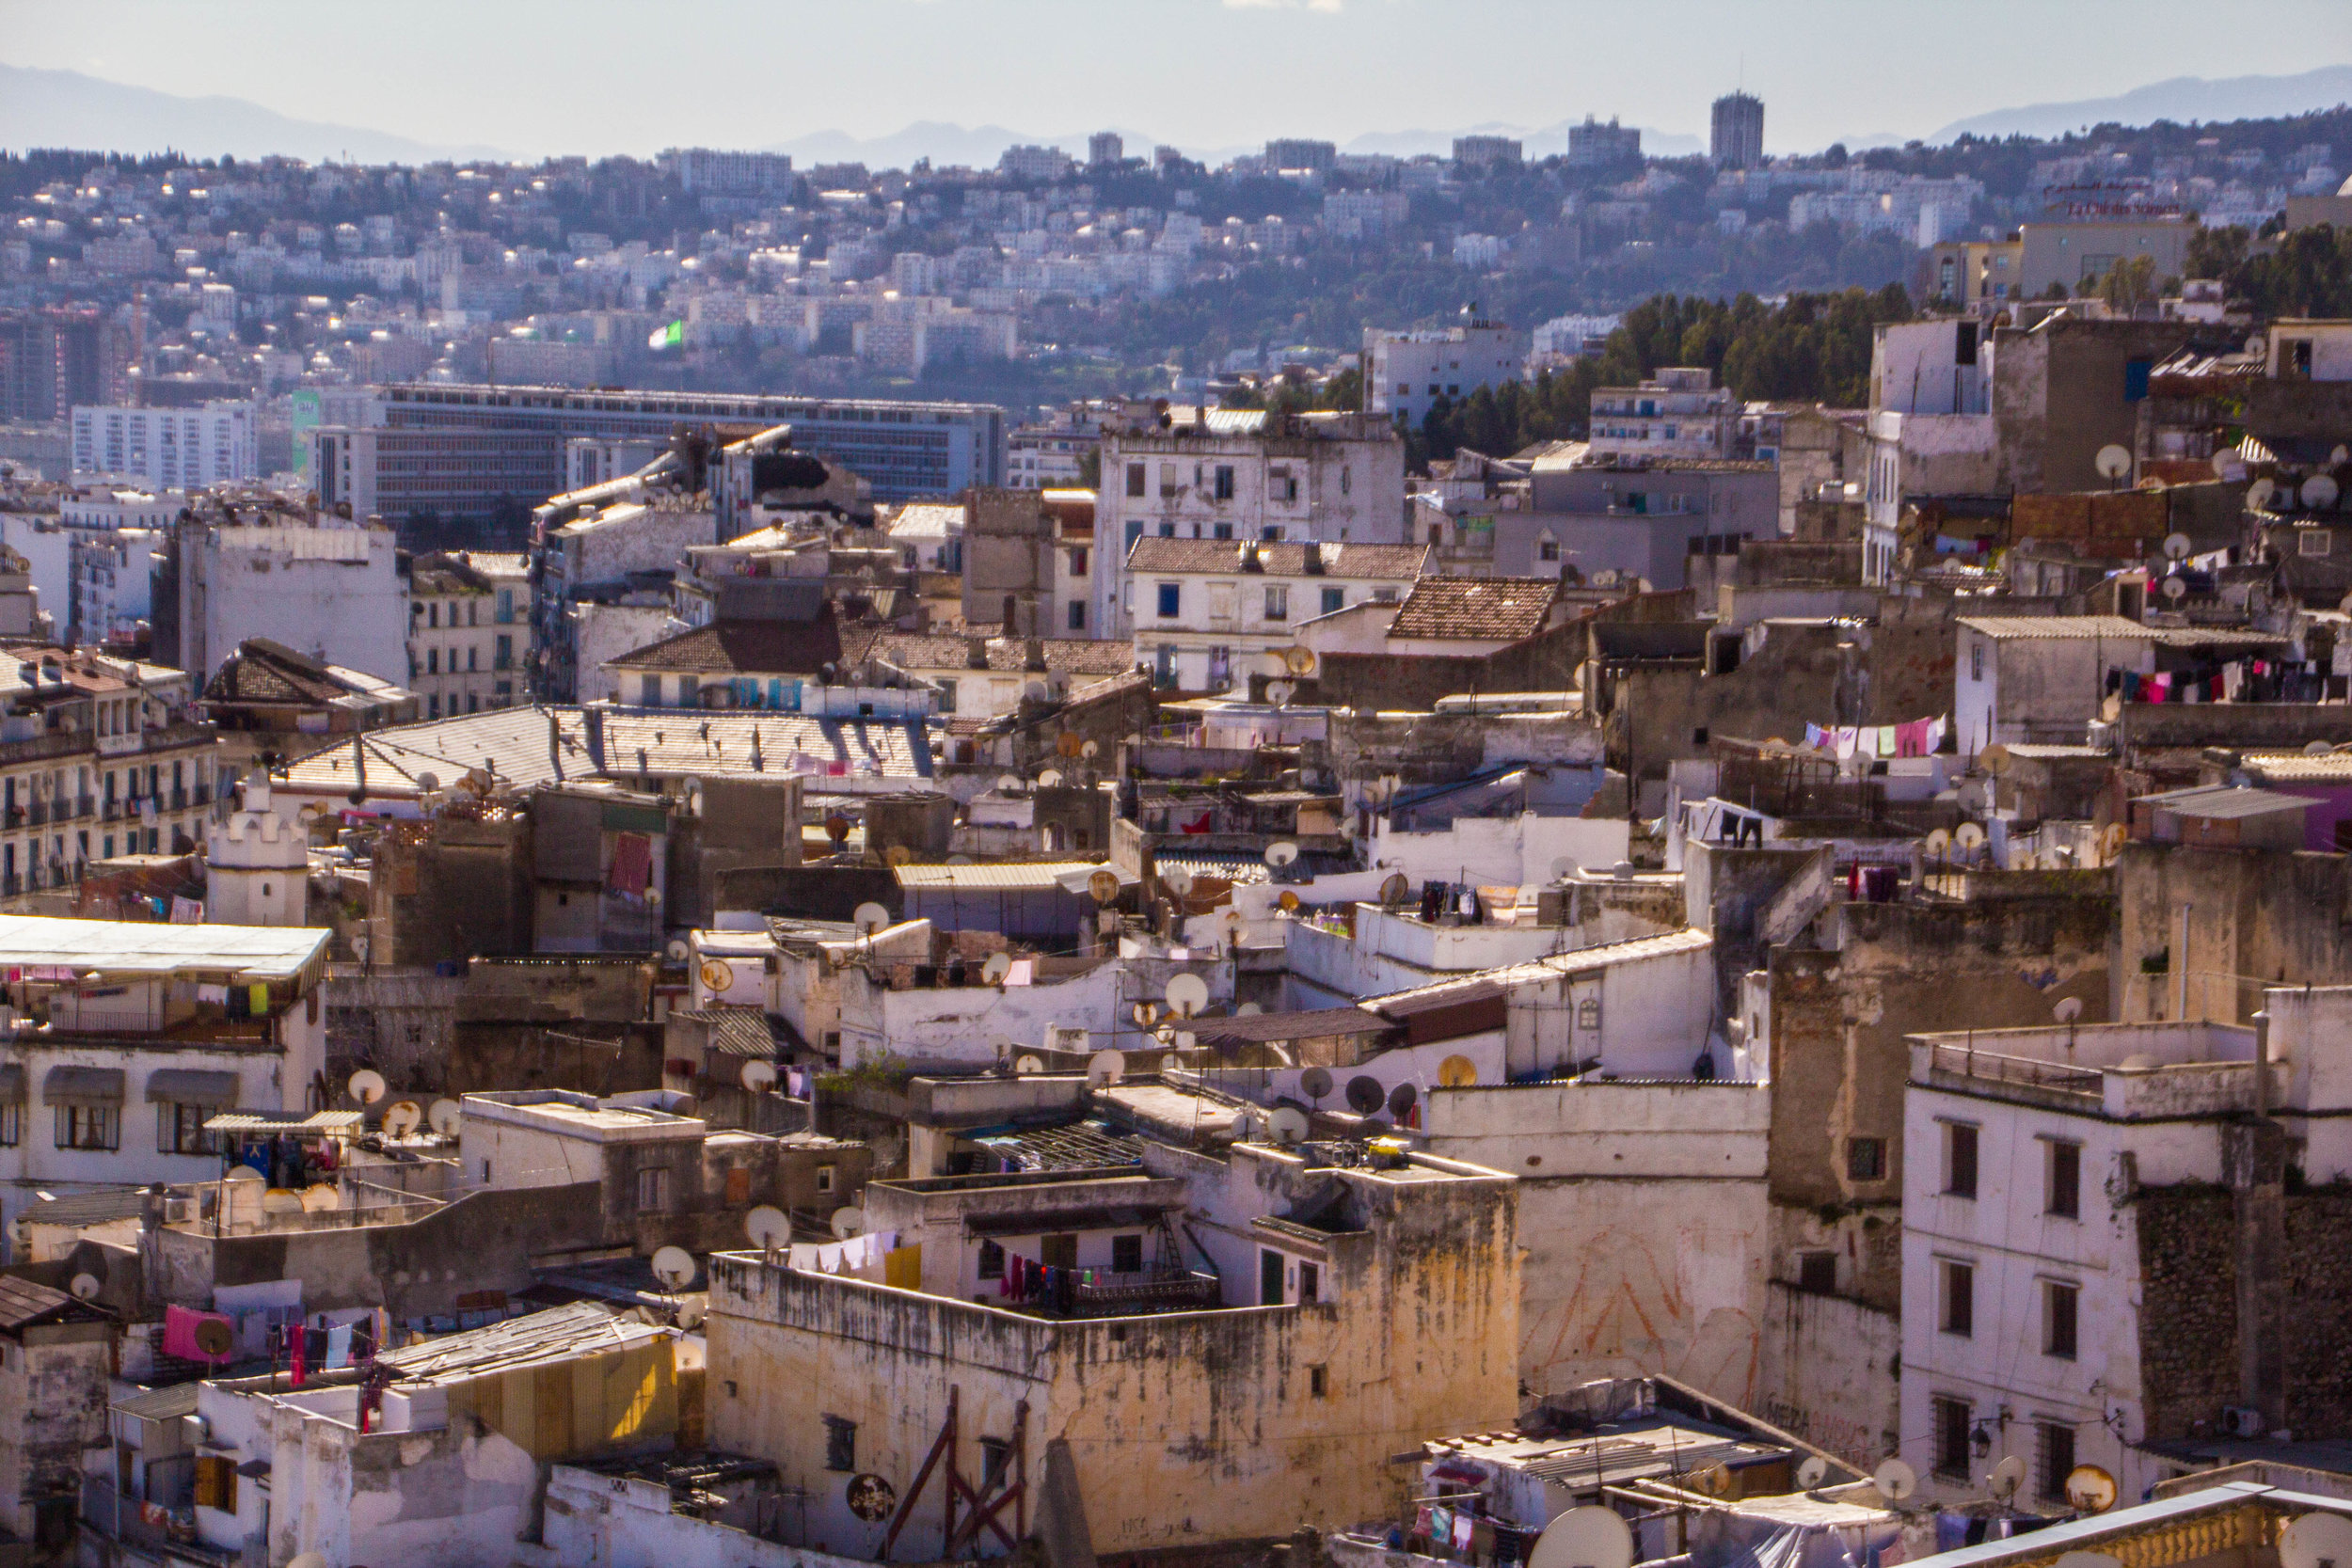 casbah-from-above-algiers-algeria-12.jpg